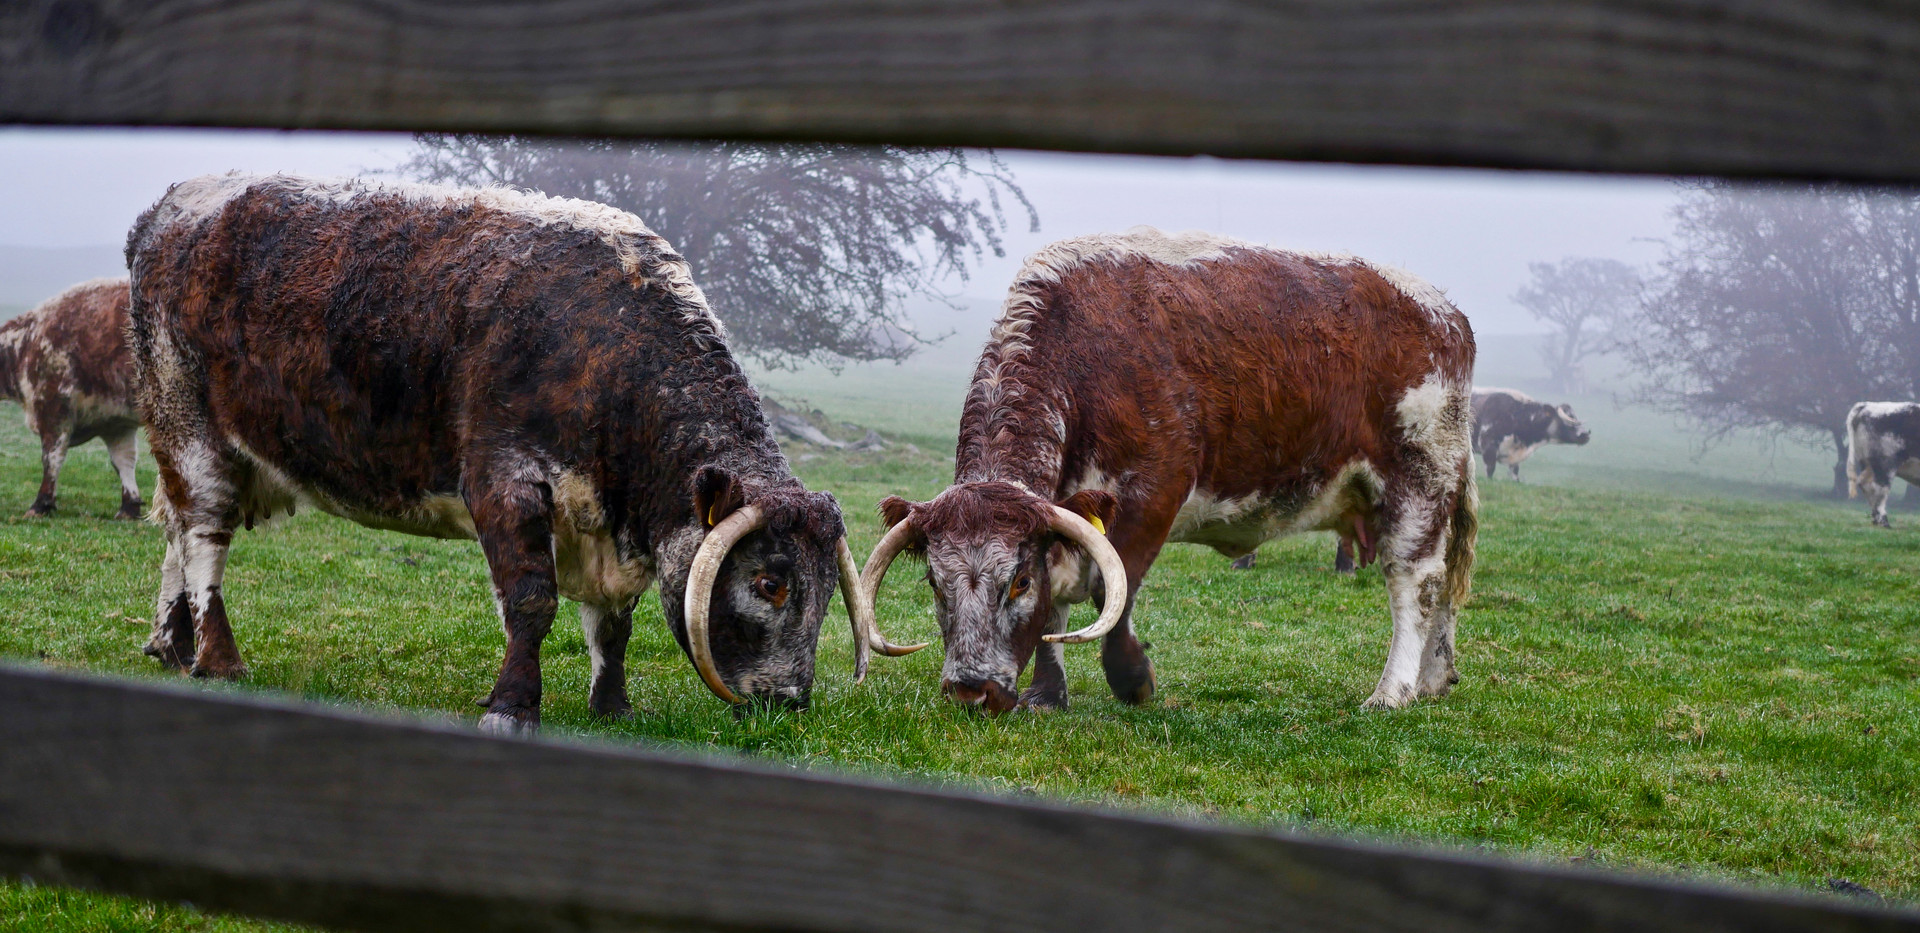 Wildlife & Livestock-12.jpg